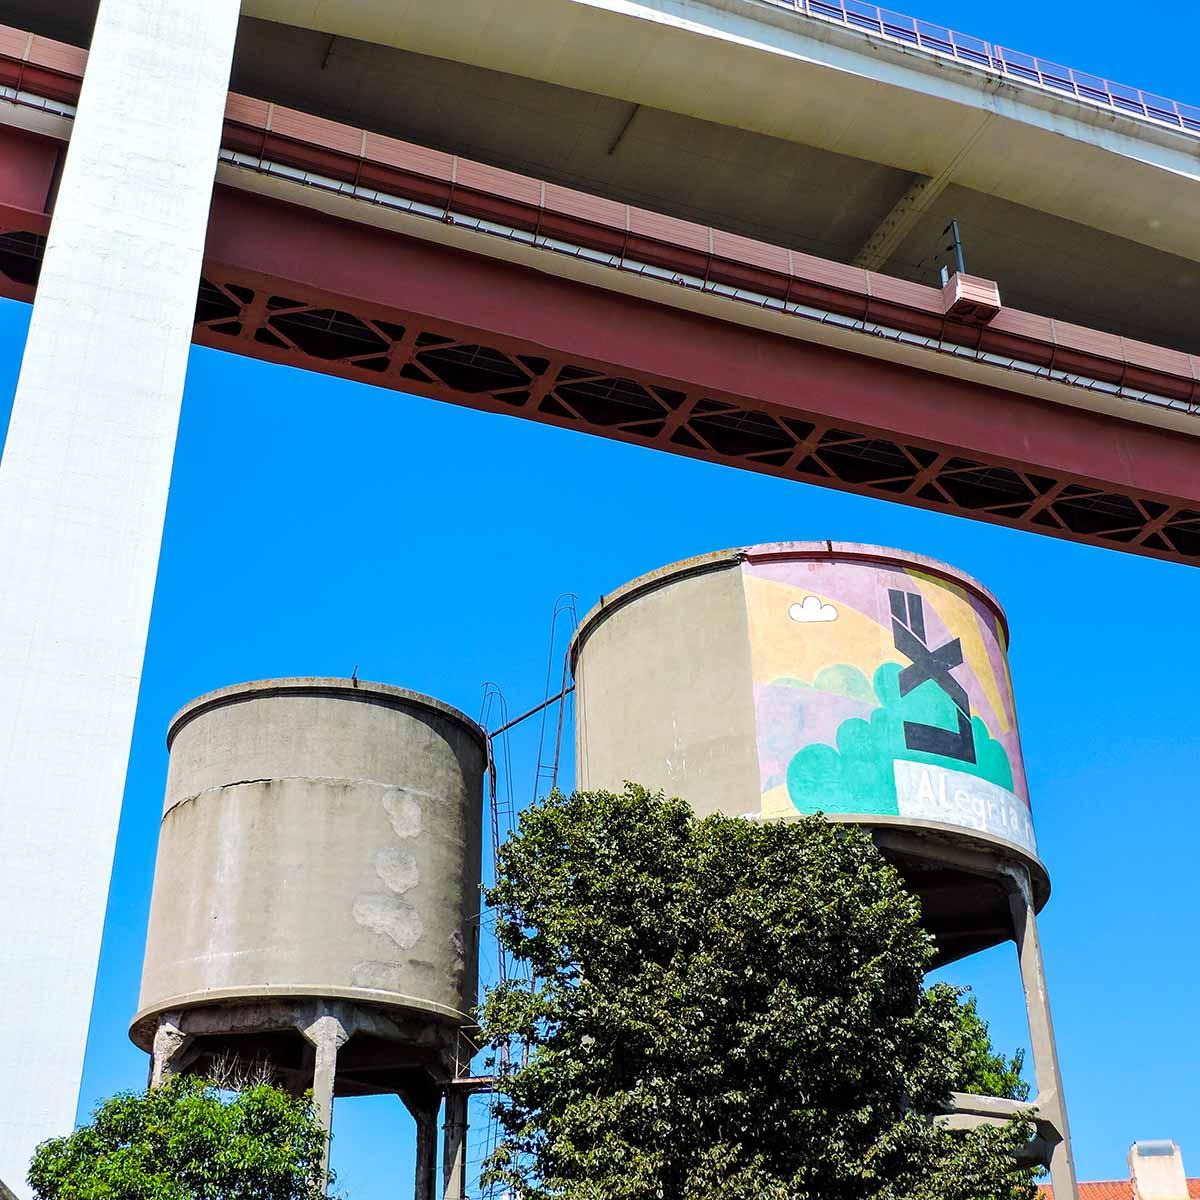 LX Factory water tanks in Belem